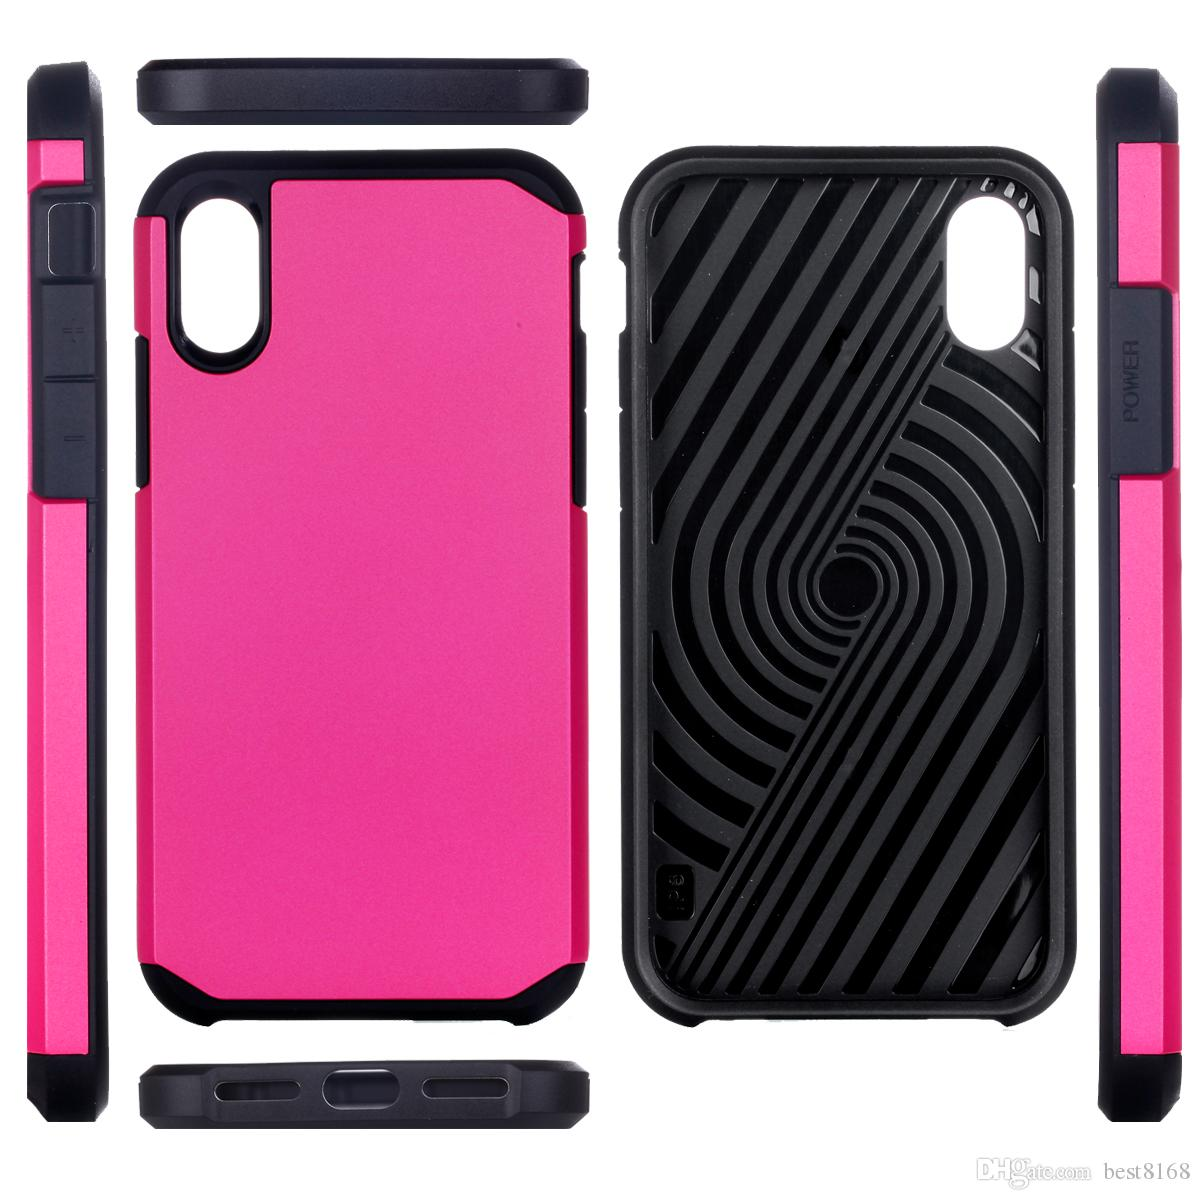 Zırh Robot Vaka Iphone X 5.8 inç / Galaxy Note8 Not 8 Sağlam Darbeye Hibrid Sert Plastik + TPU Defender Lüks Cep Telefonu Cilt Kapak